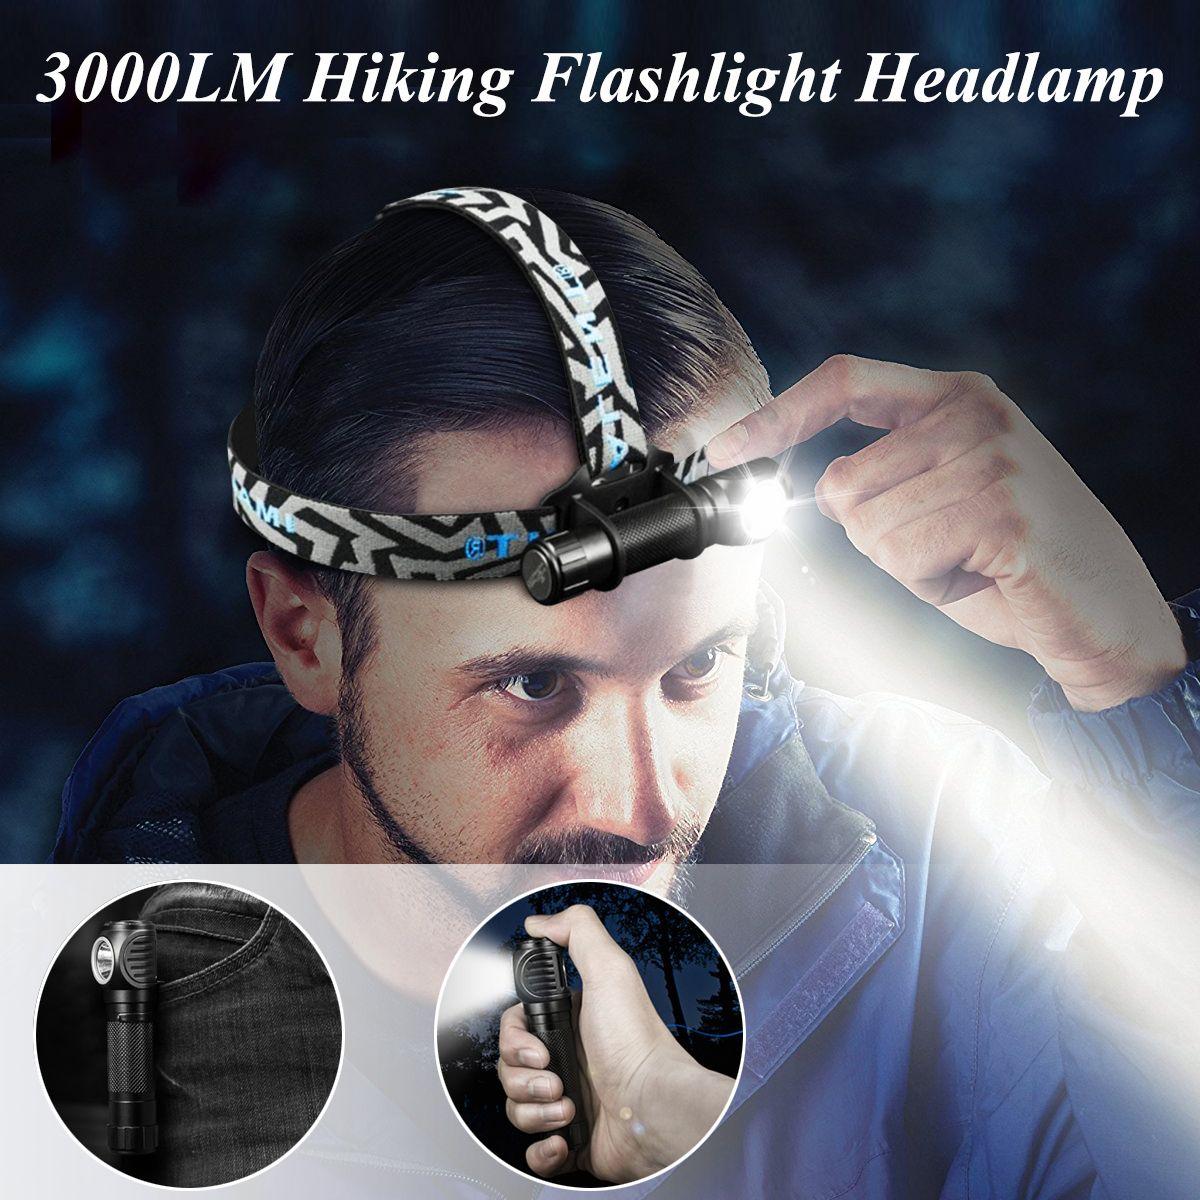 Professional HR70 XHP70.2 3000LM Handheld Flashlight Hiking Light Charge LED Flashlight  Brightness Magnetic USB Charge